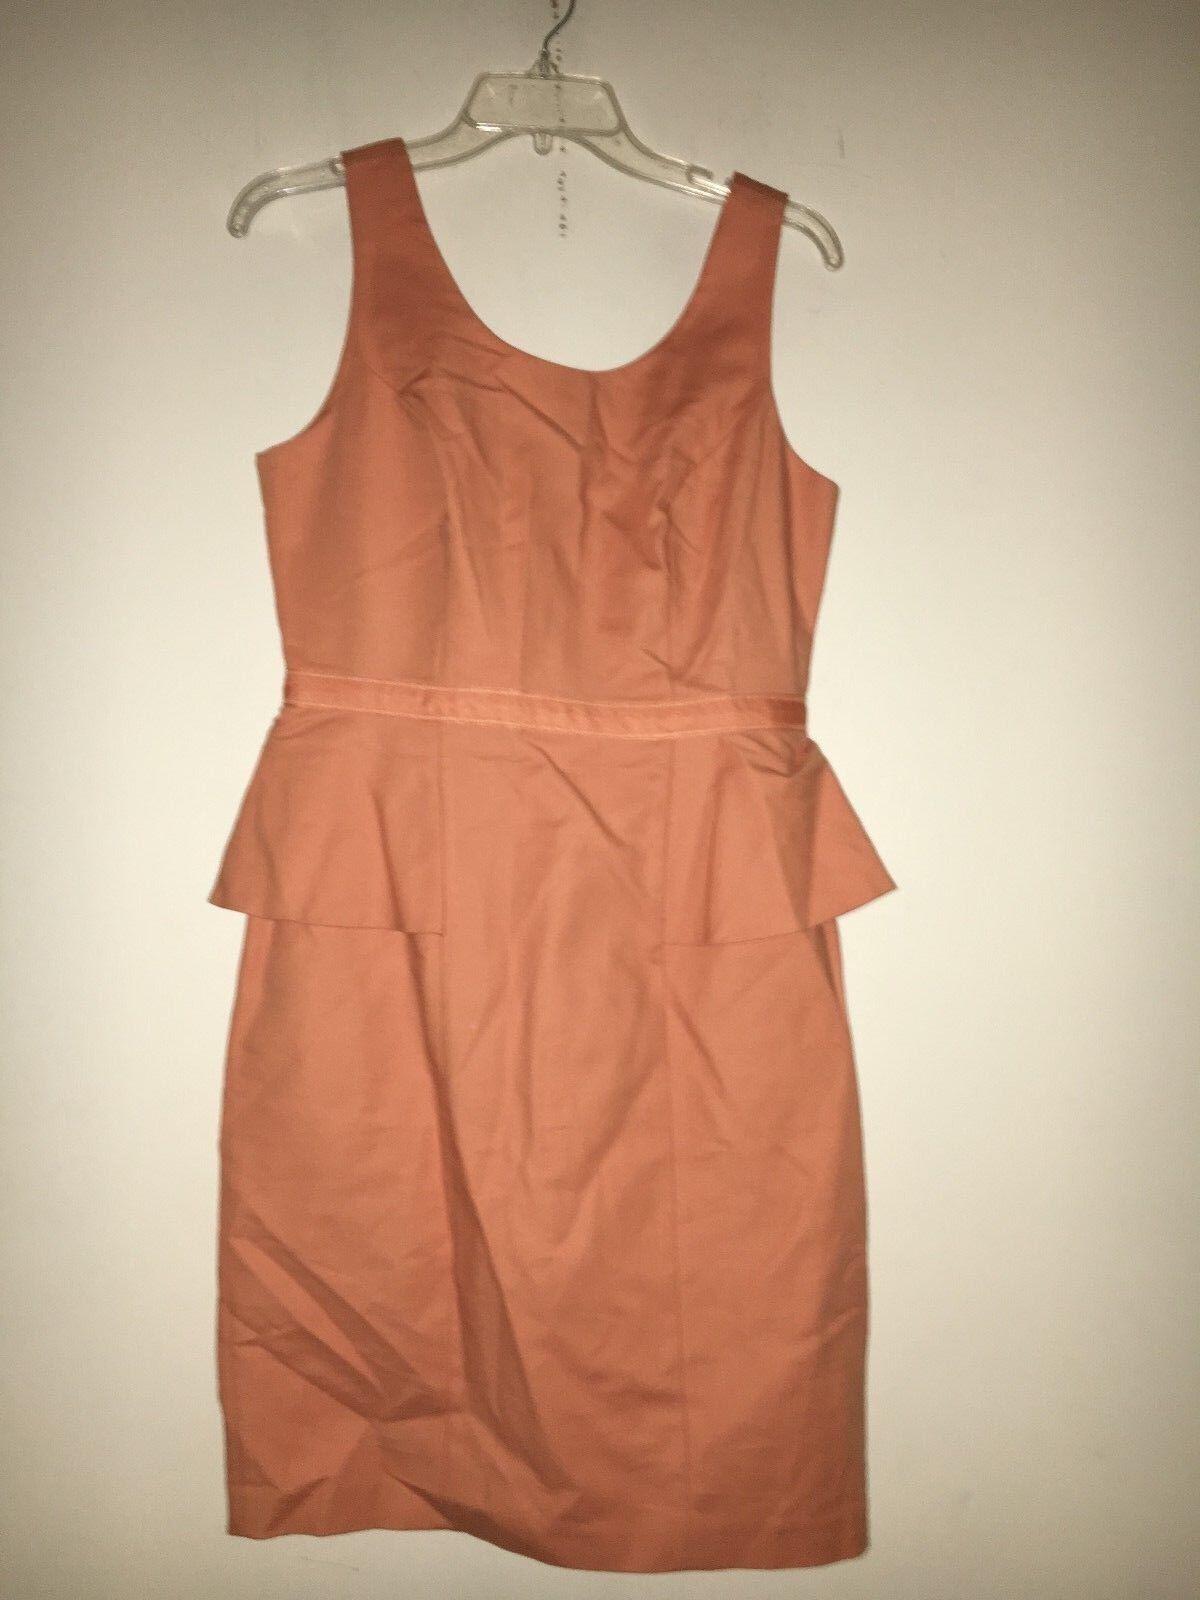 NWT THE LIMITED TANGERINE damen DRESS Größe 6 FORMAL EVENING